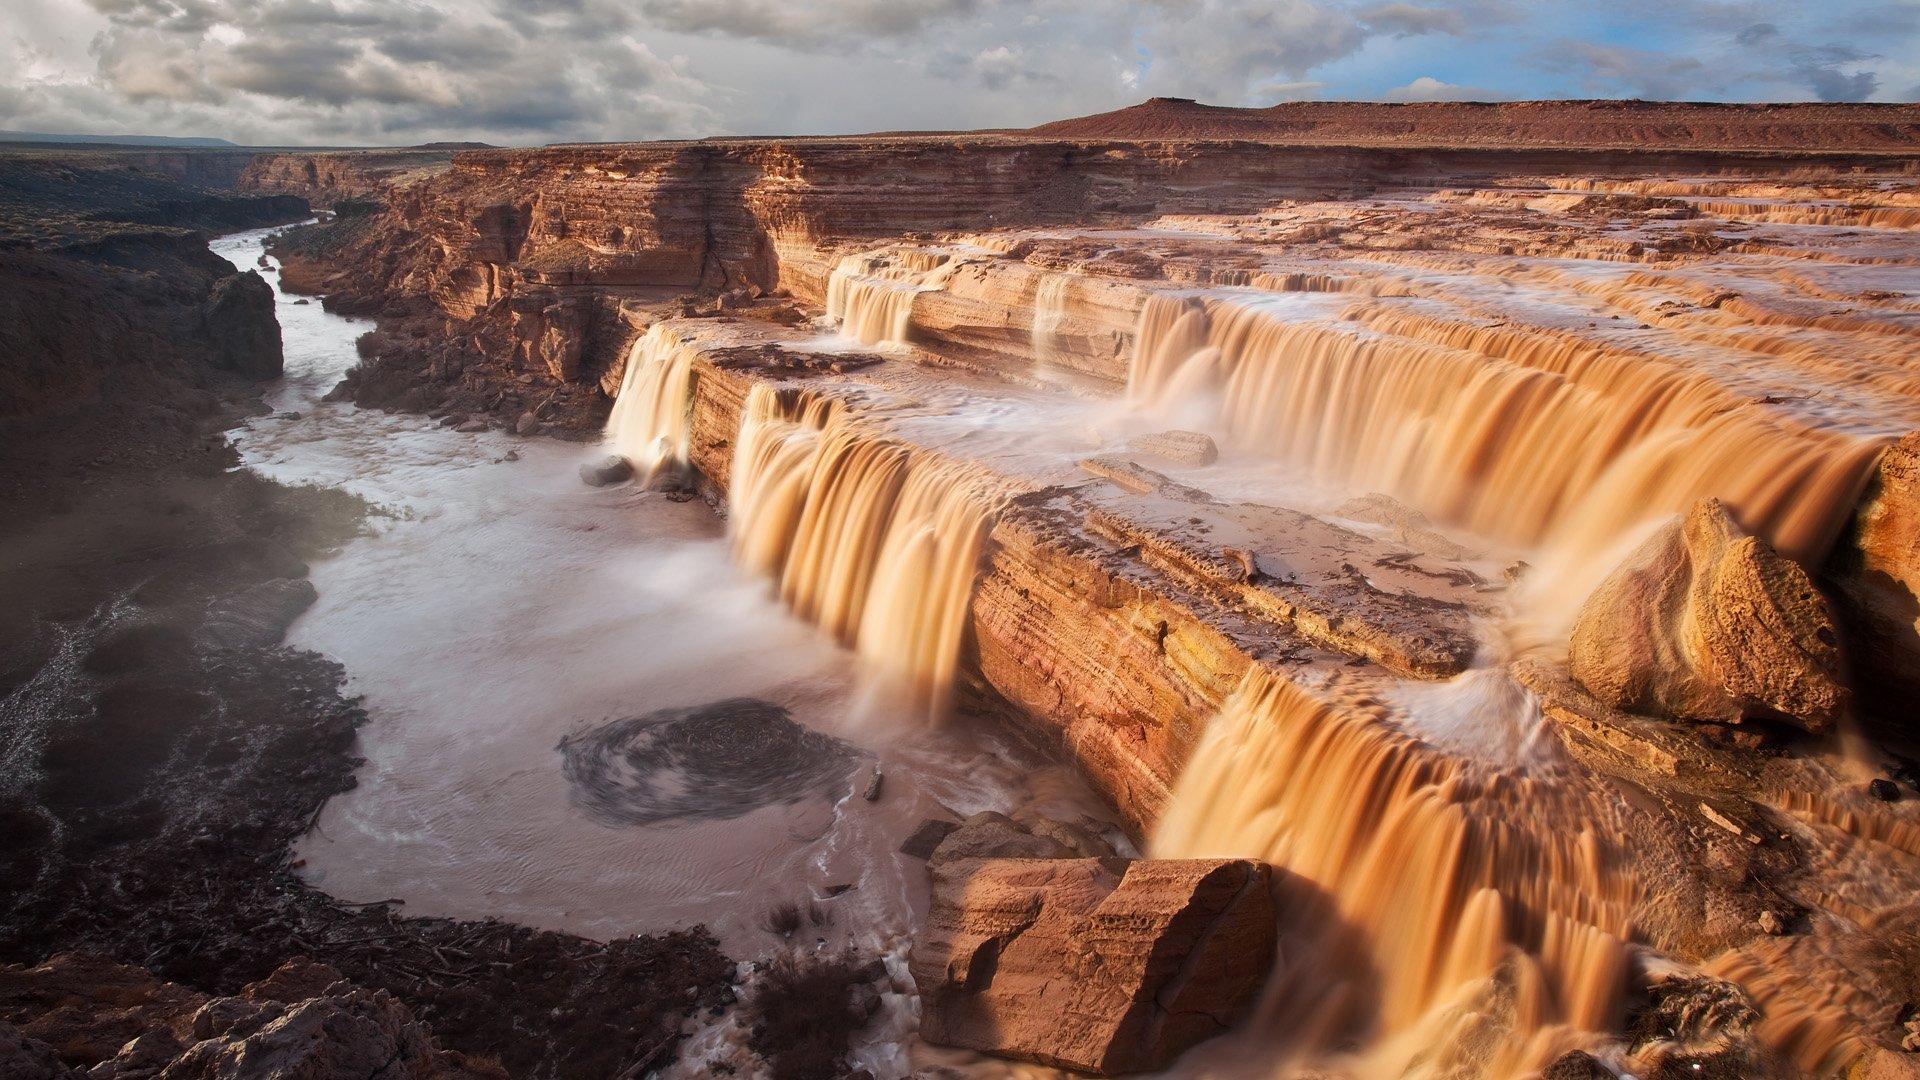 Niagara Falls Hd 1080p Wallpapers Grand Falls Little Colorado River Arizona Full Hd